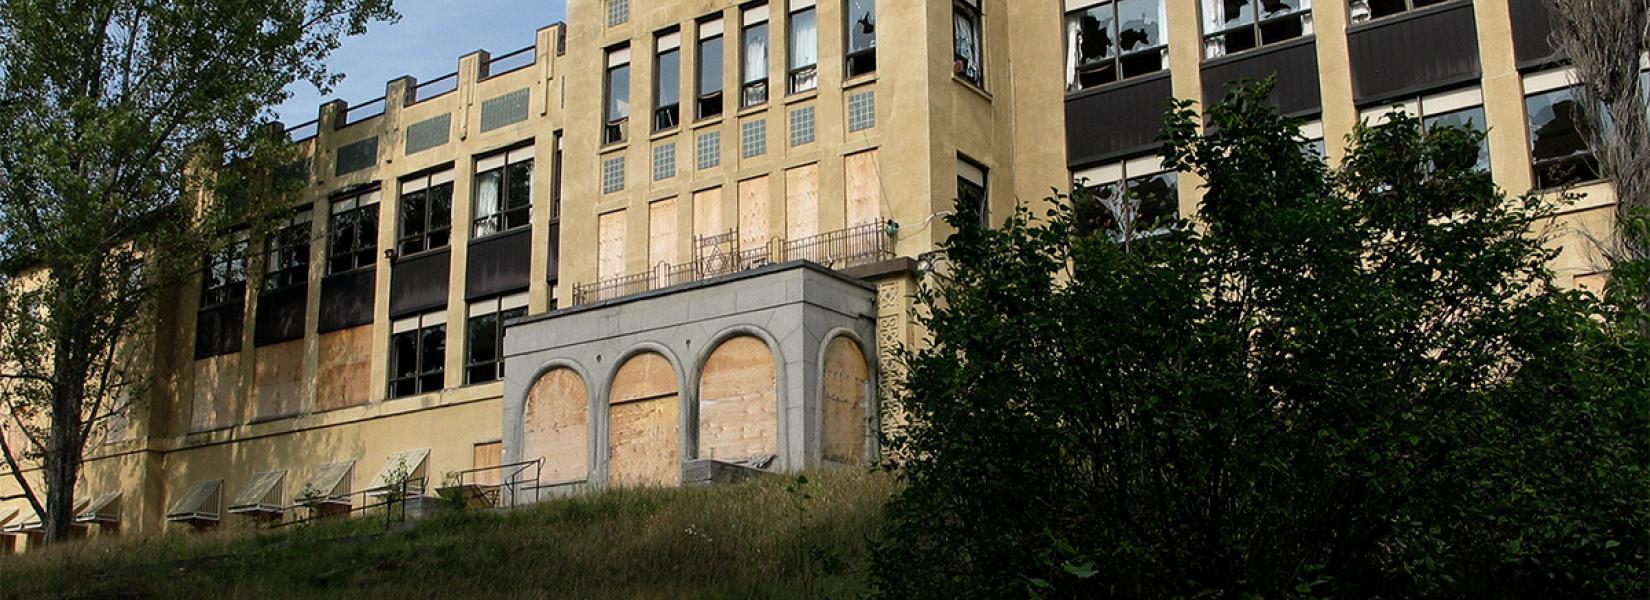 Mount Sinai Sanatorium